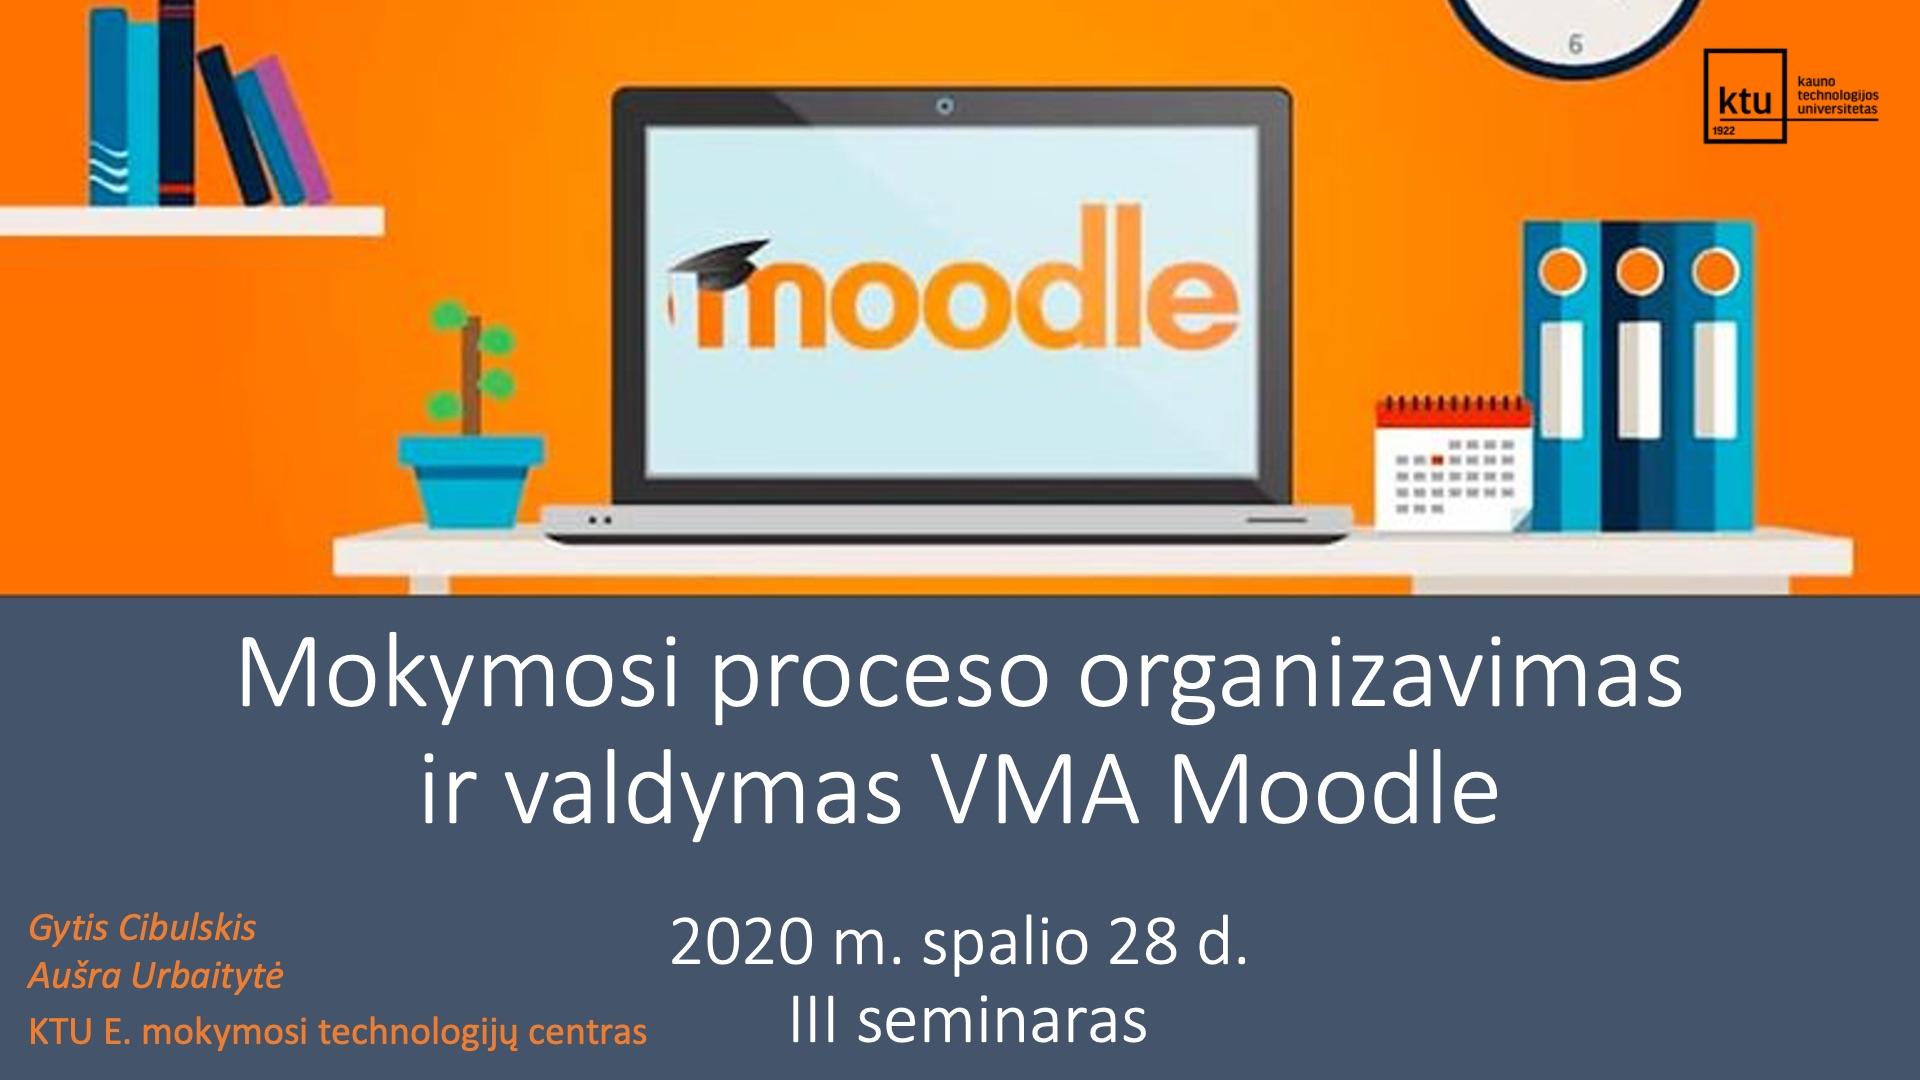 2020.10.28 Moodle mokymai (III seminaras)